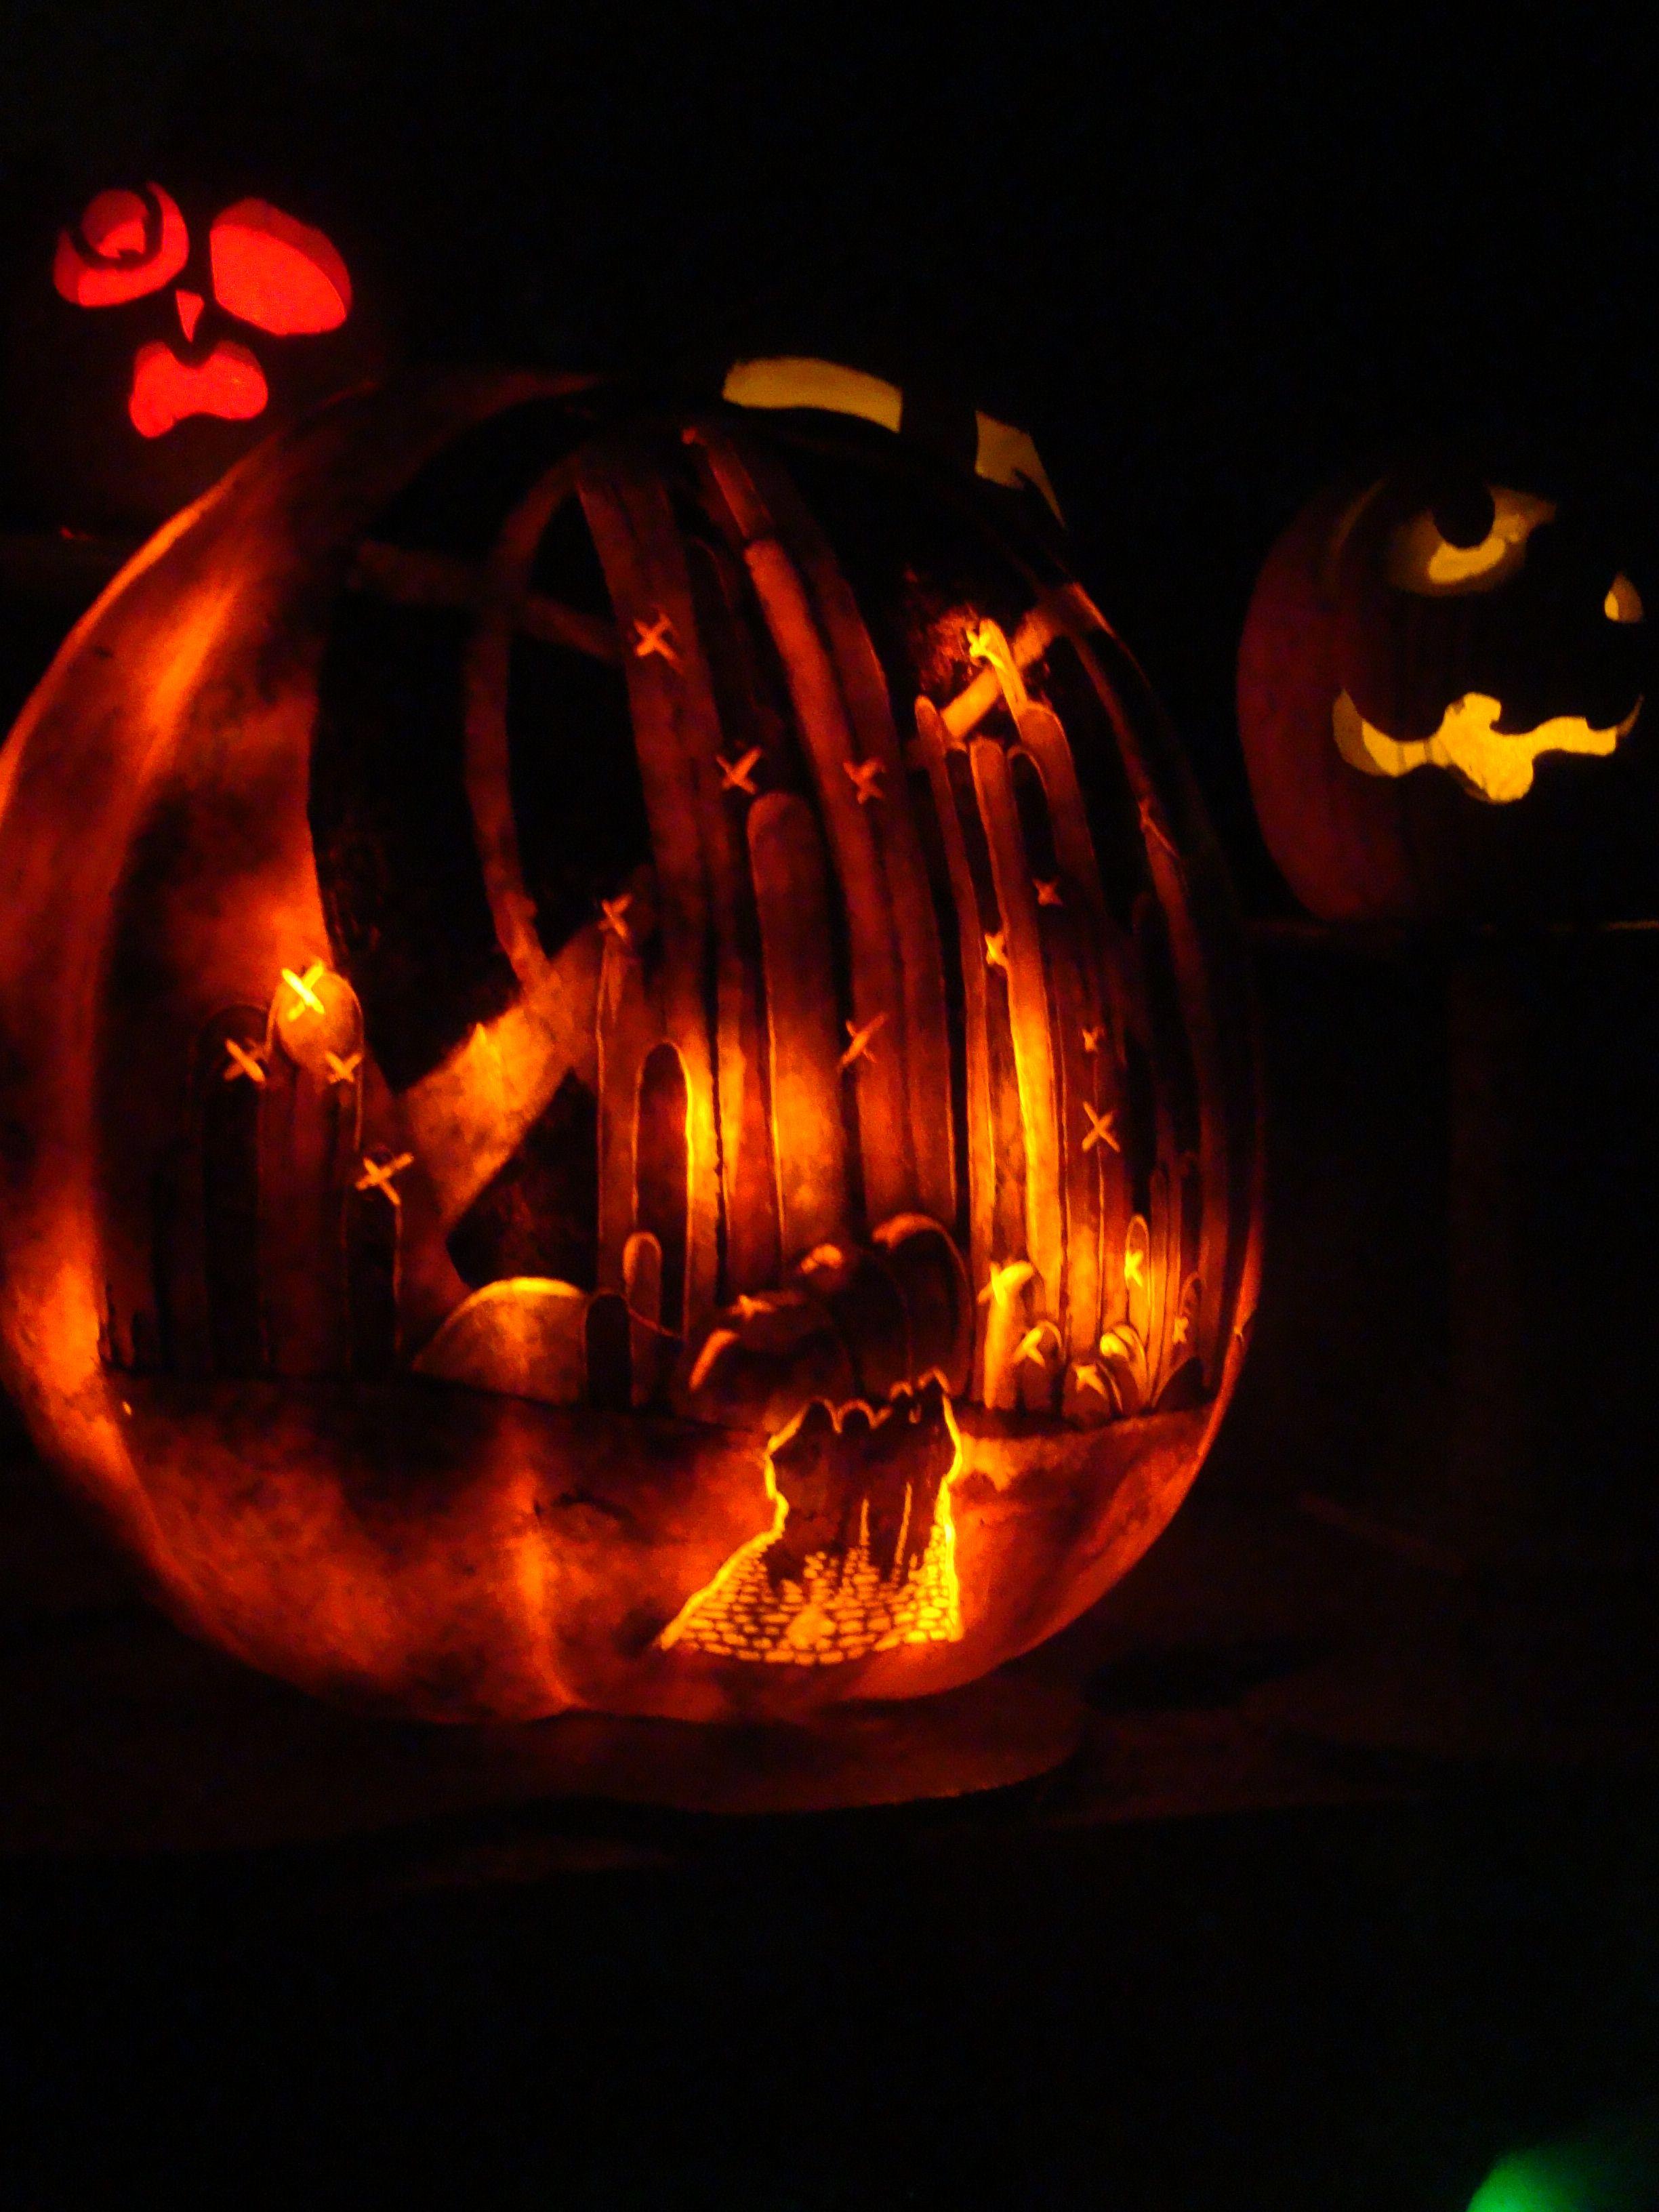 The Wizard of Oz 11 Pumpkin carving, Pumpkin, Carving